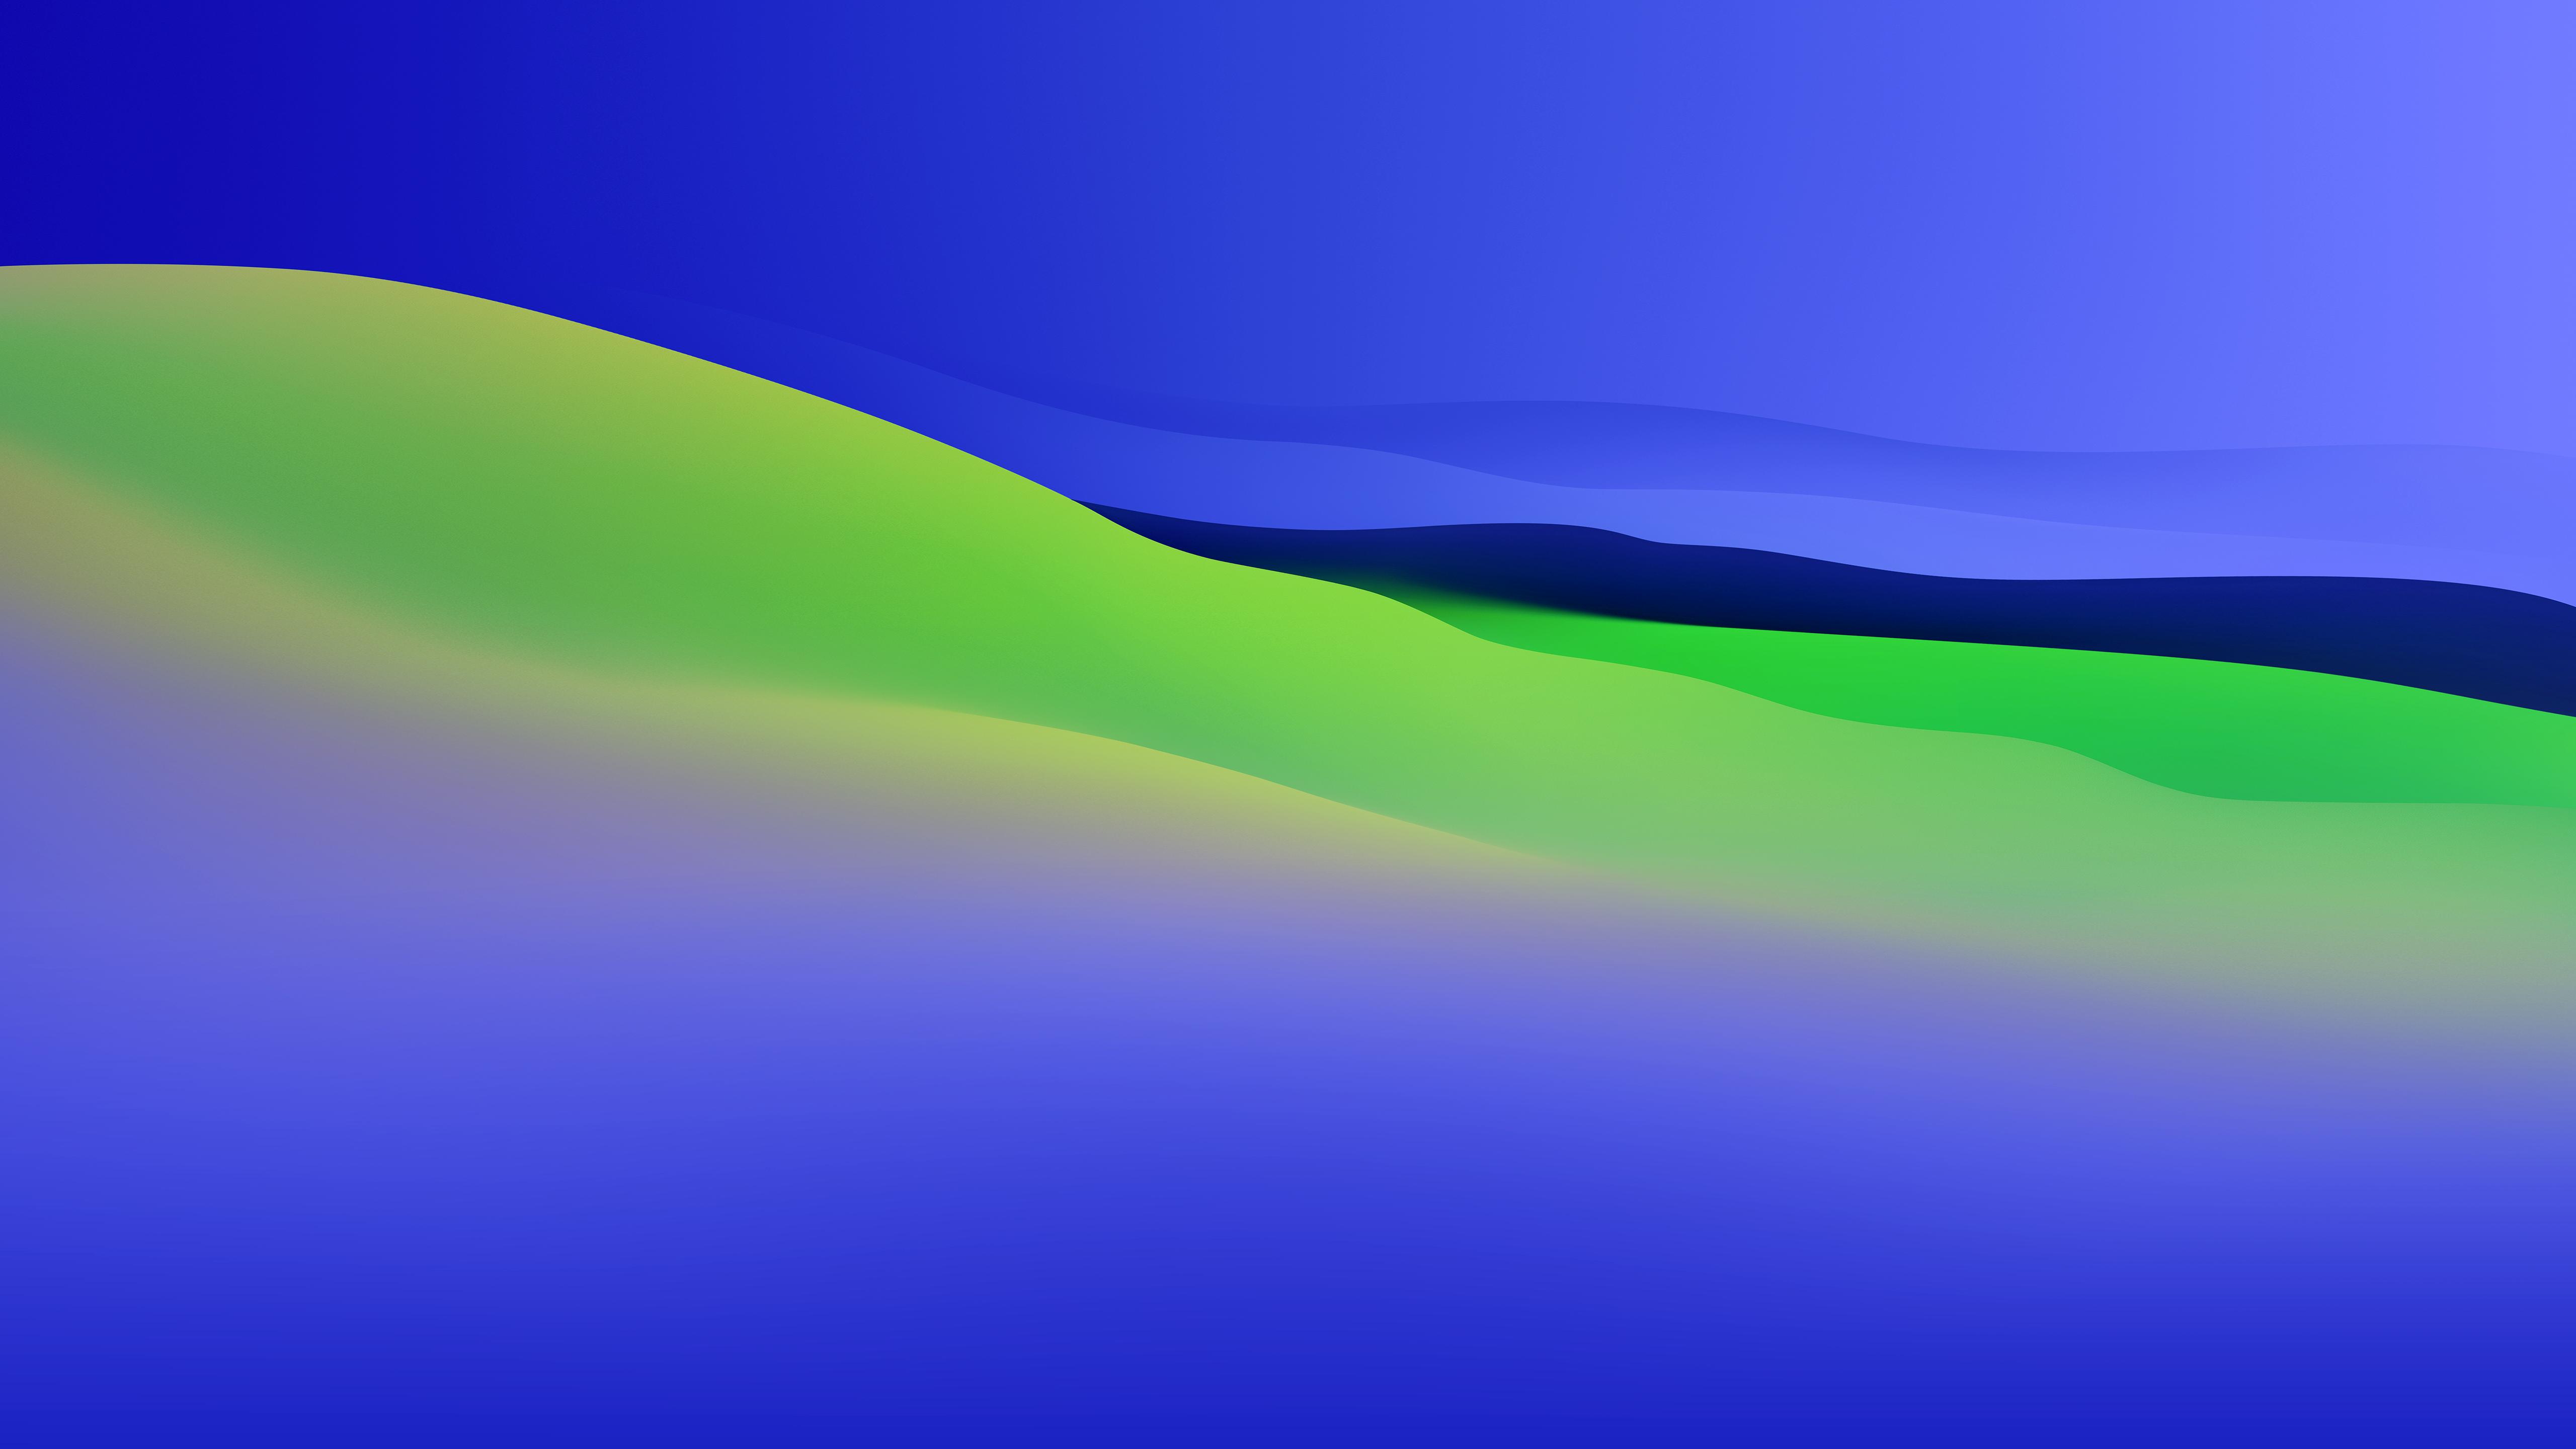 Macos 11 Big Sur Modified Wallpaper Blue Green 5k Retina Ultra Hd Wallpaper Background Image 5120x2880 Id 1083662 Wallpaper Abyss